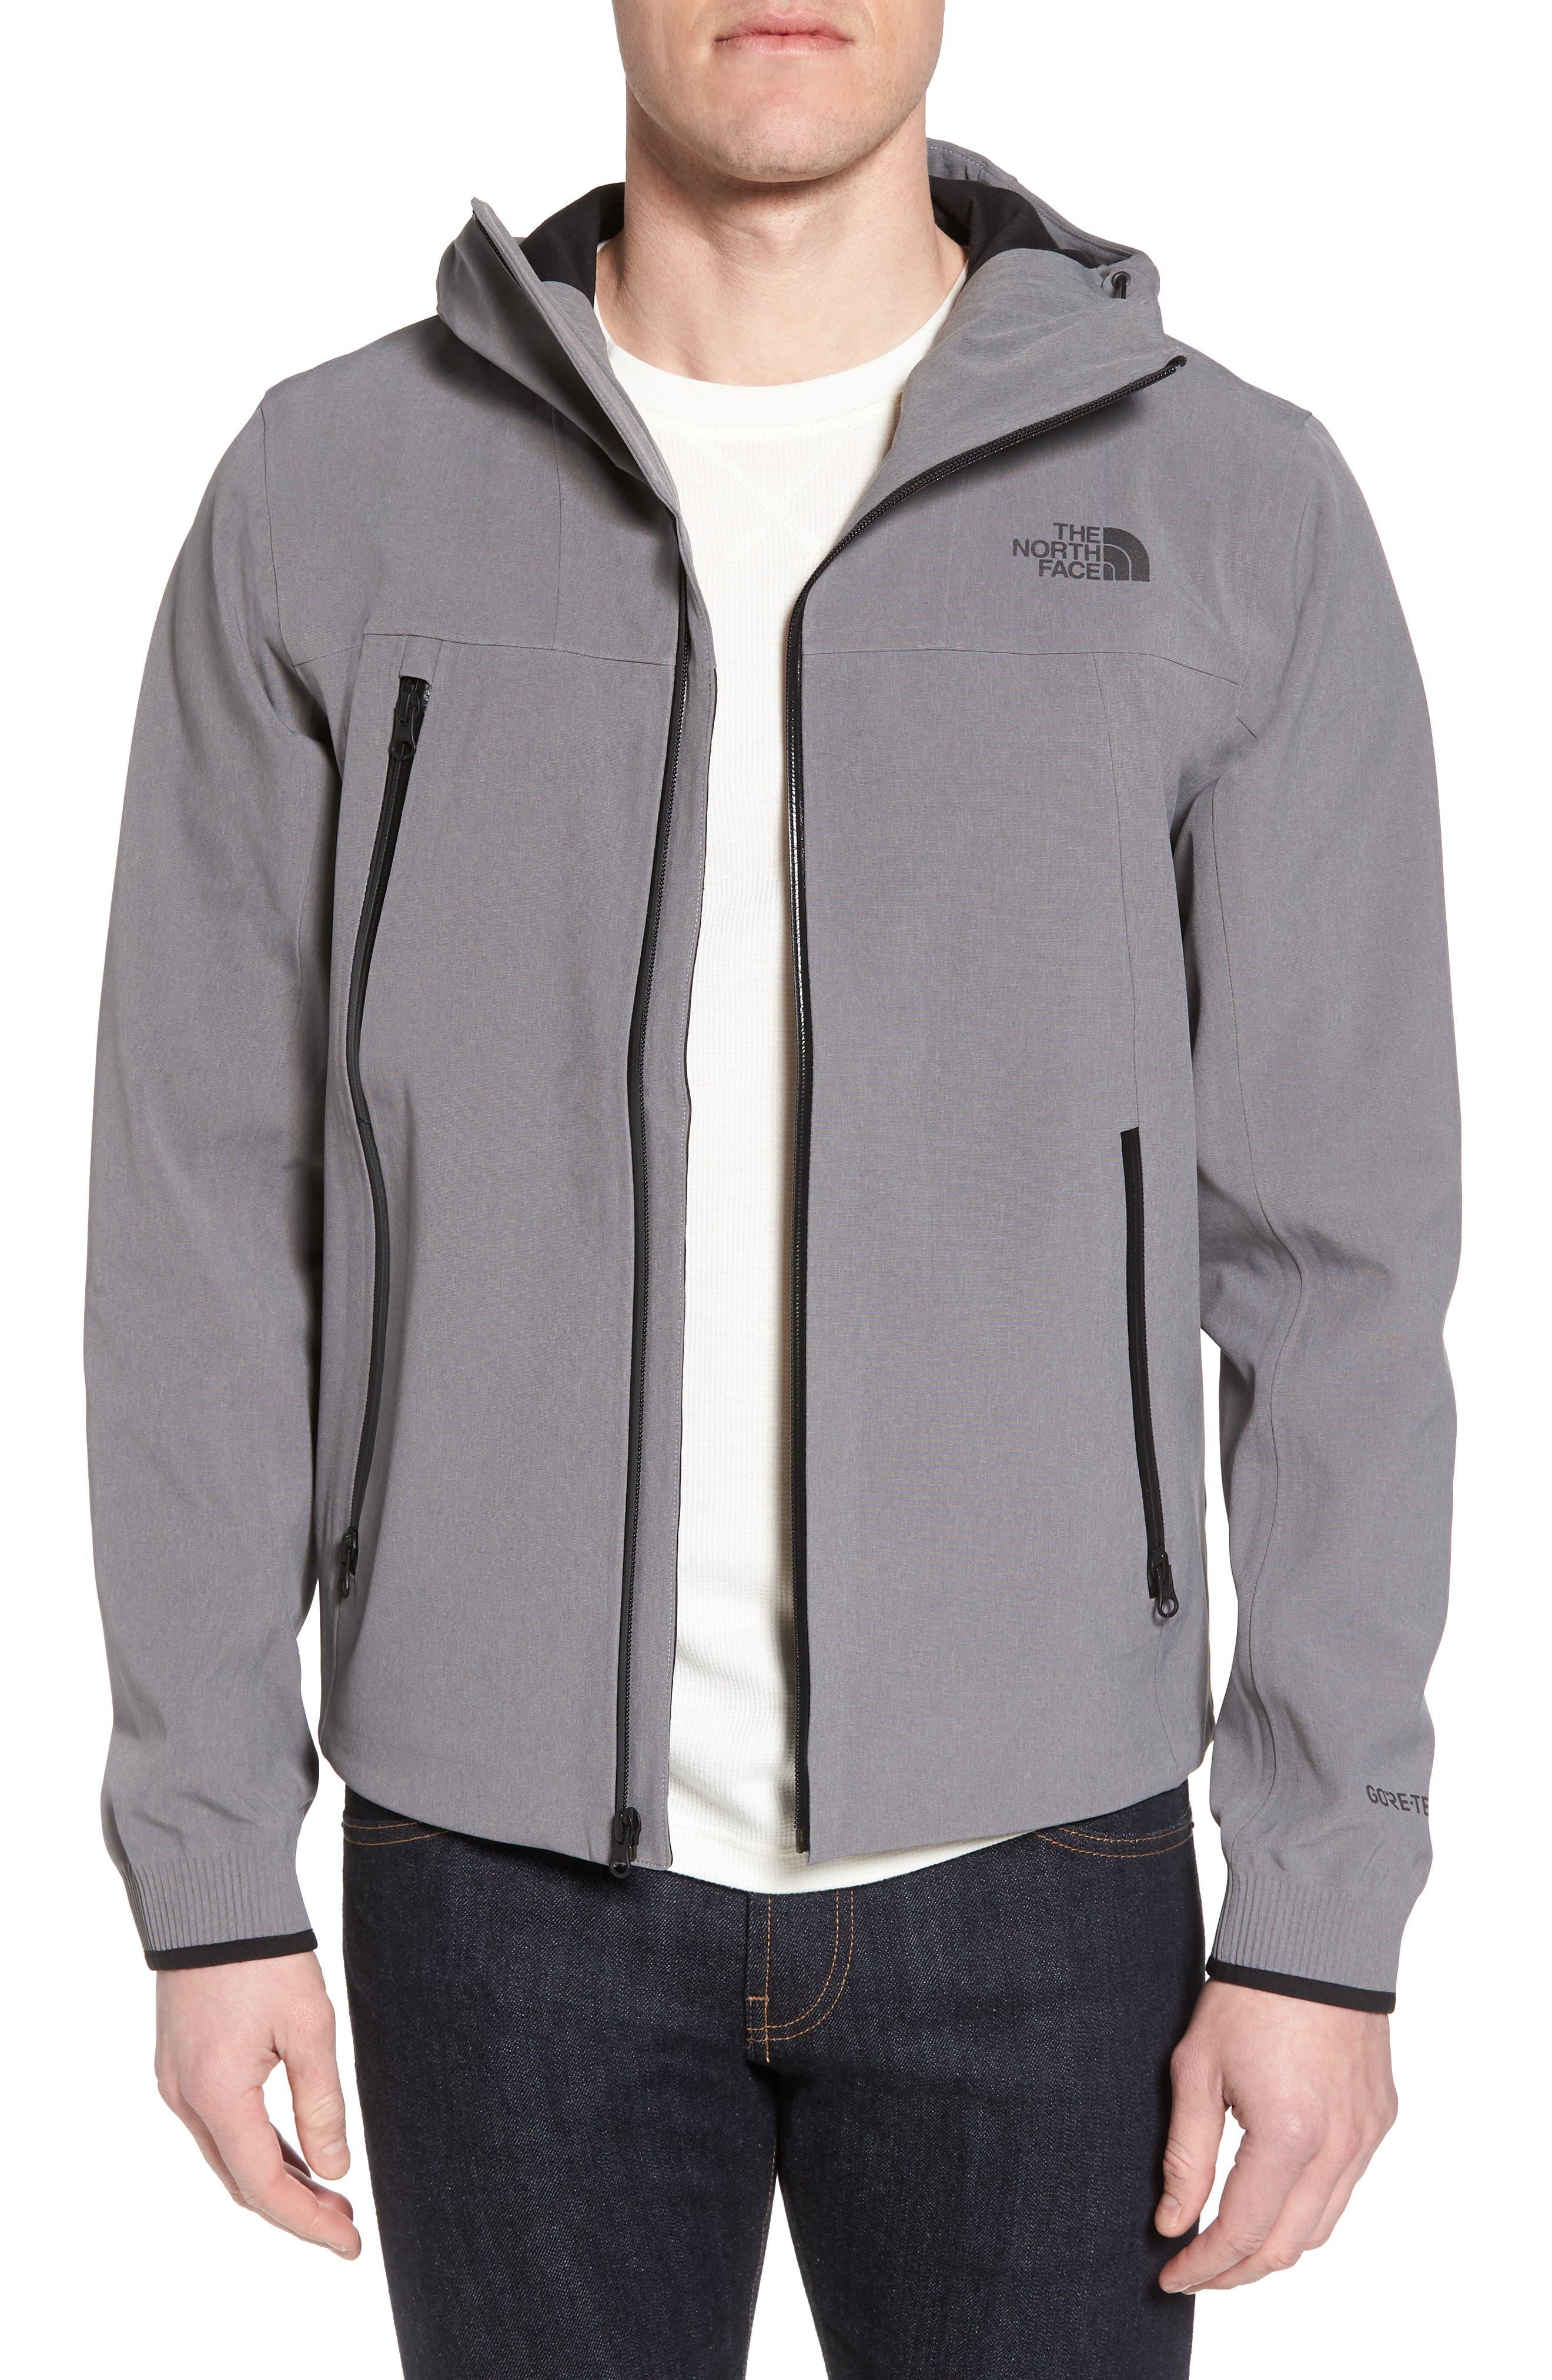 Apex Flex Gore-Tex<sup>®</sup> Waterproof Jacket,                             Main thumbnail 1, color,                             Medium Grey Heather